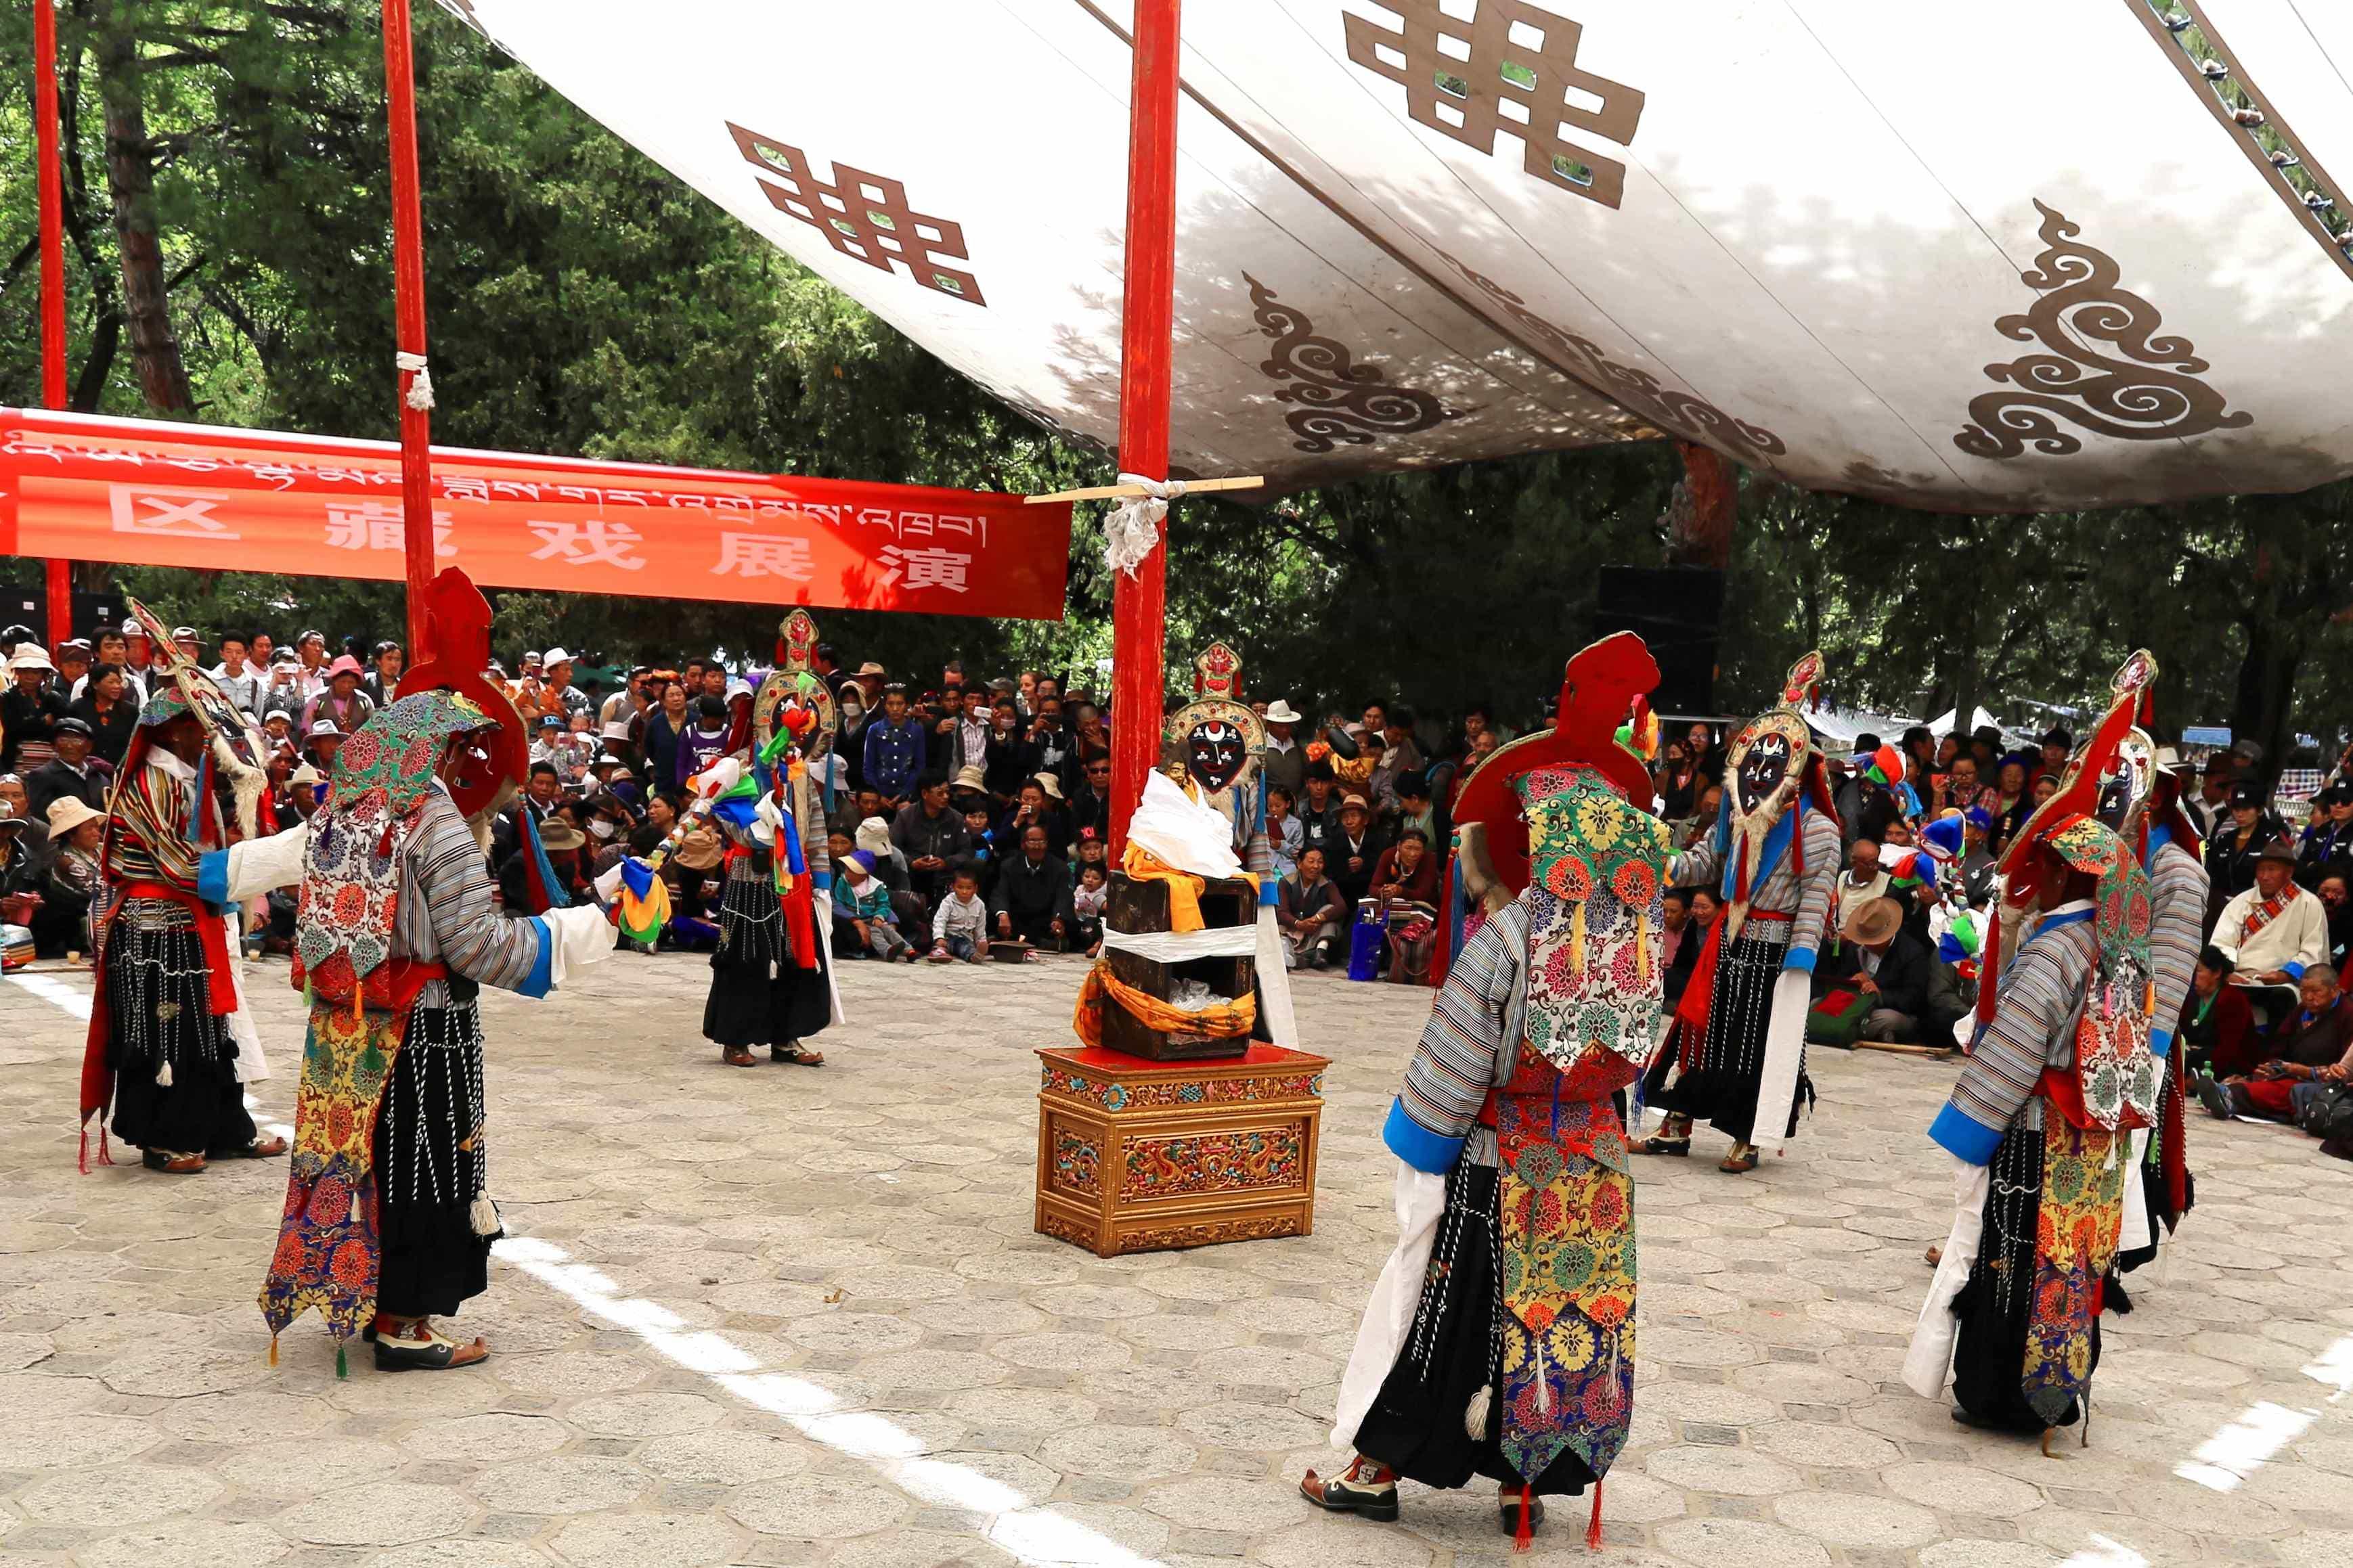 Opera Dance in Norbulingka during Shoton Festival